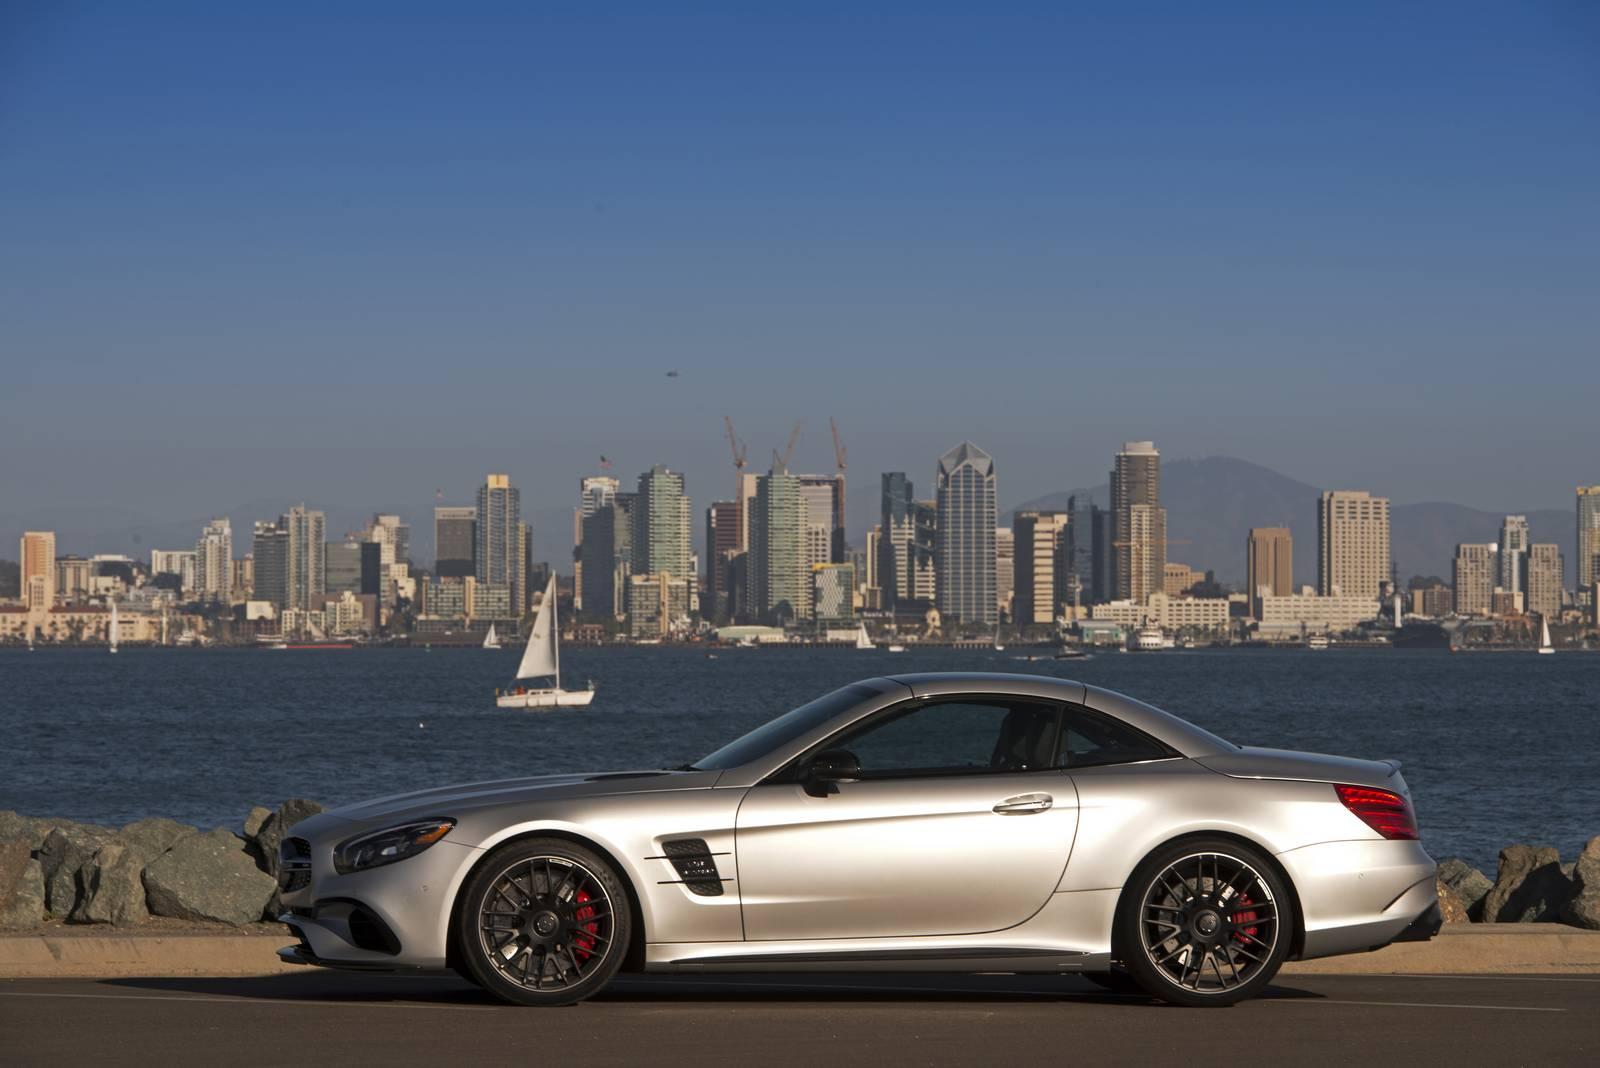 https://storage.googleapis.com/gtspirit/uploads/2016/02/Iridium-Silver-Metallic-Mercedes-AMG-SL-63-5.jpg